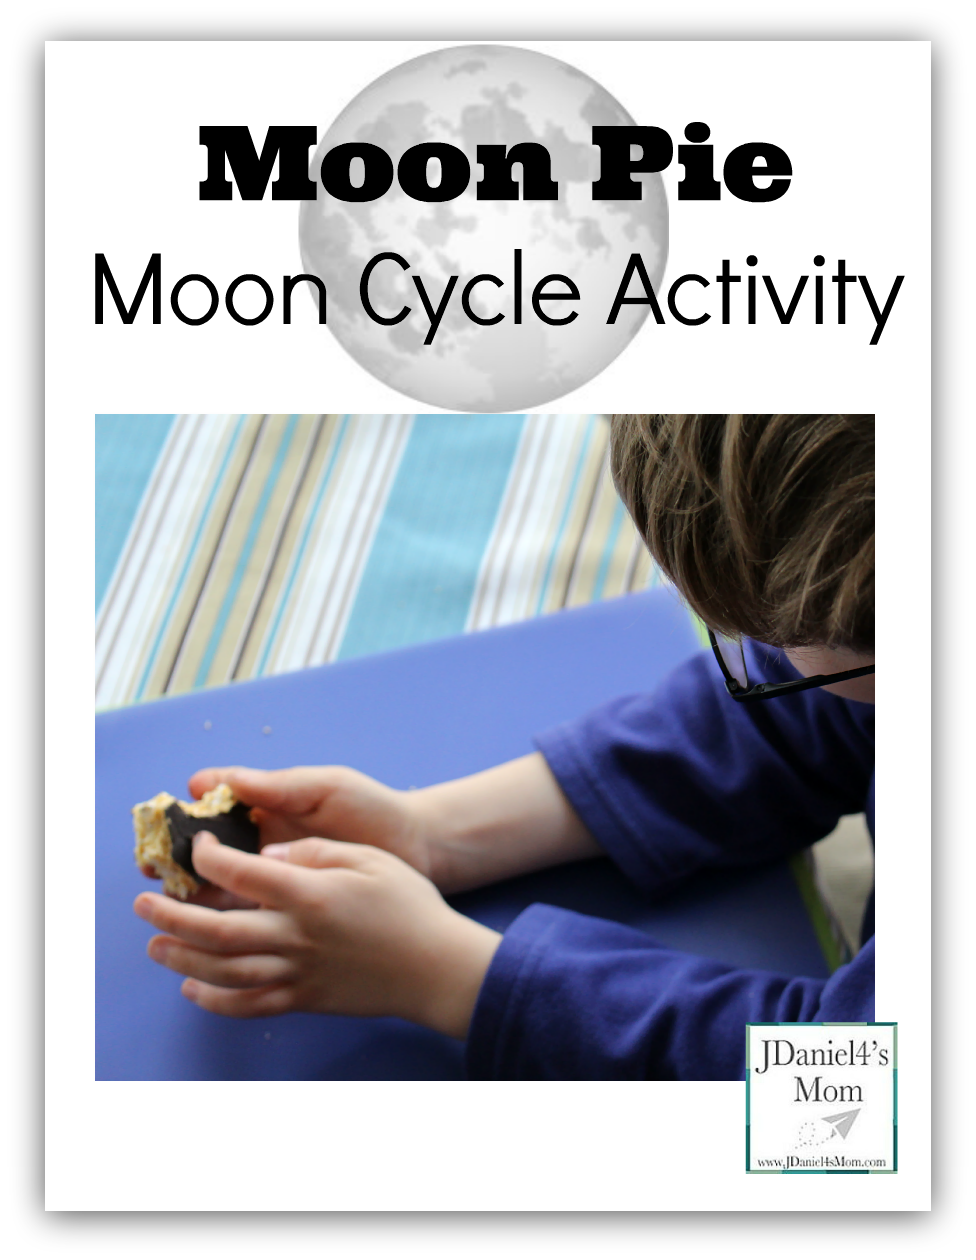 Moon Pie Moon Cycle Activity